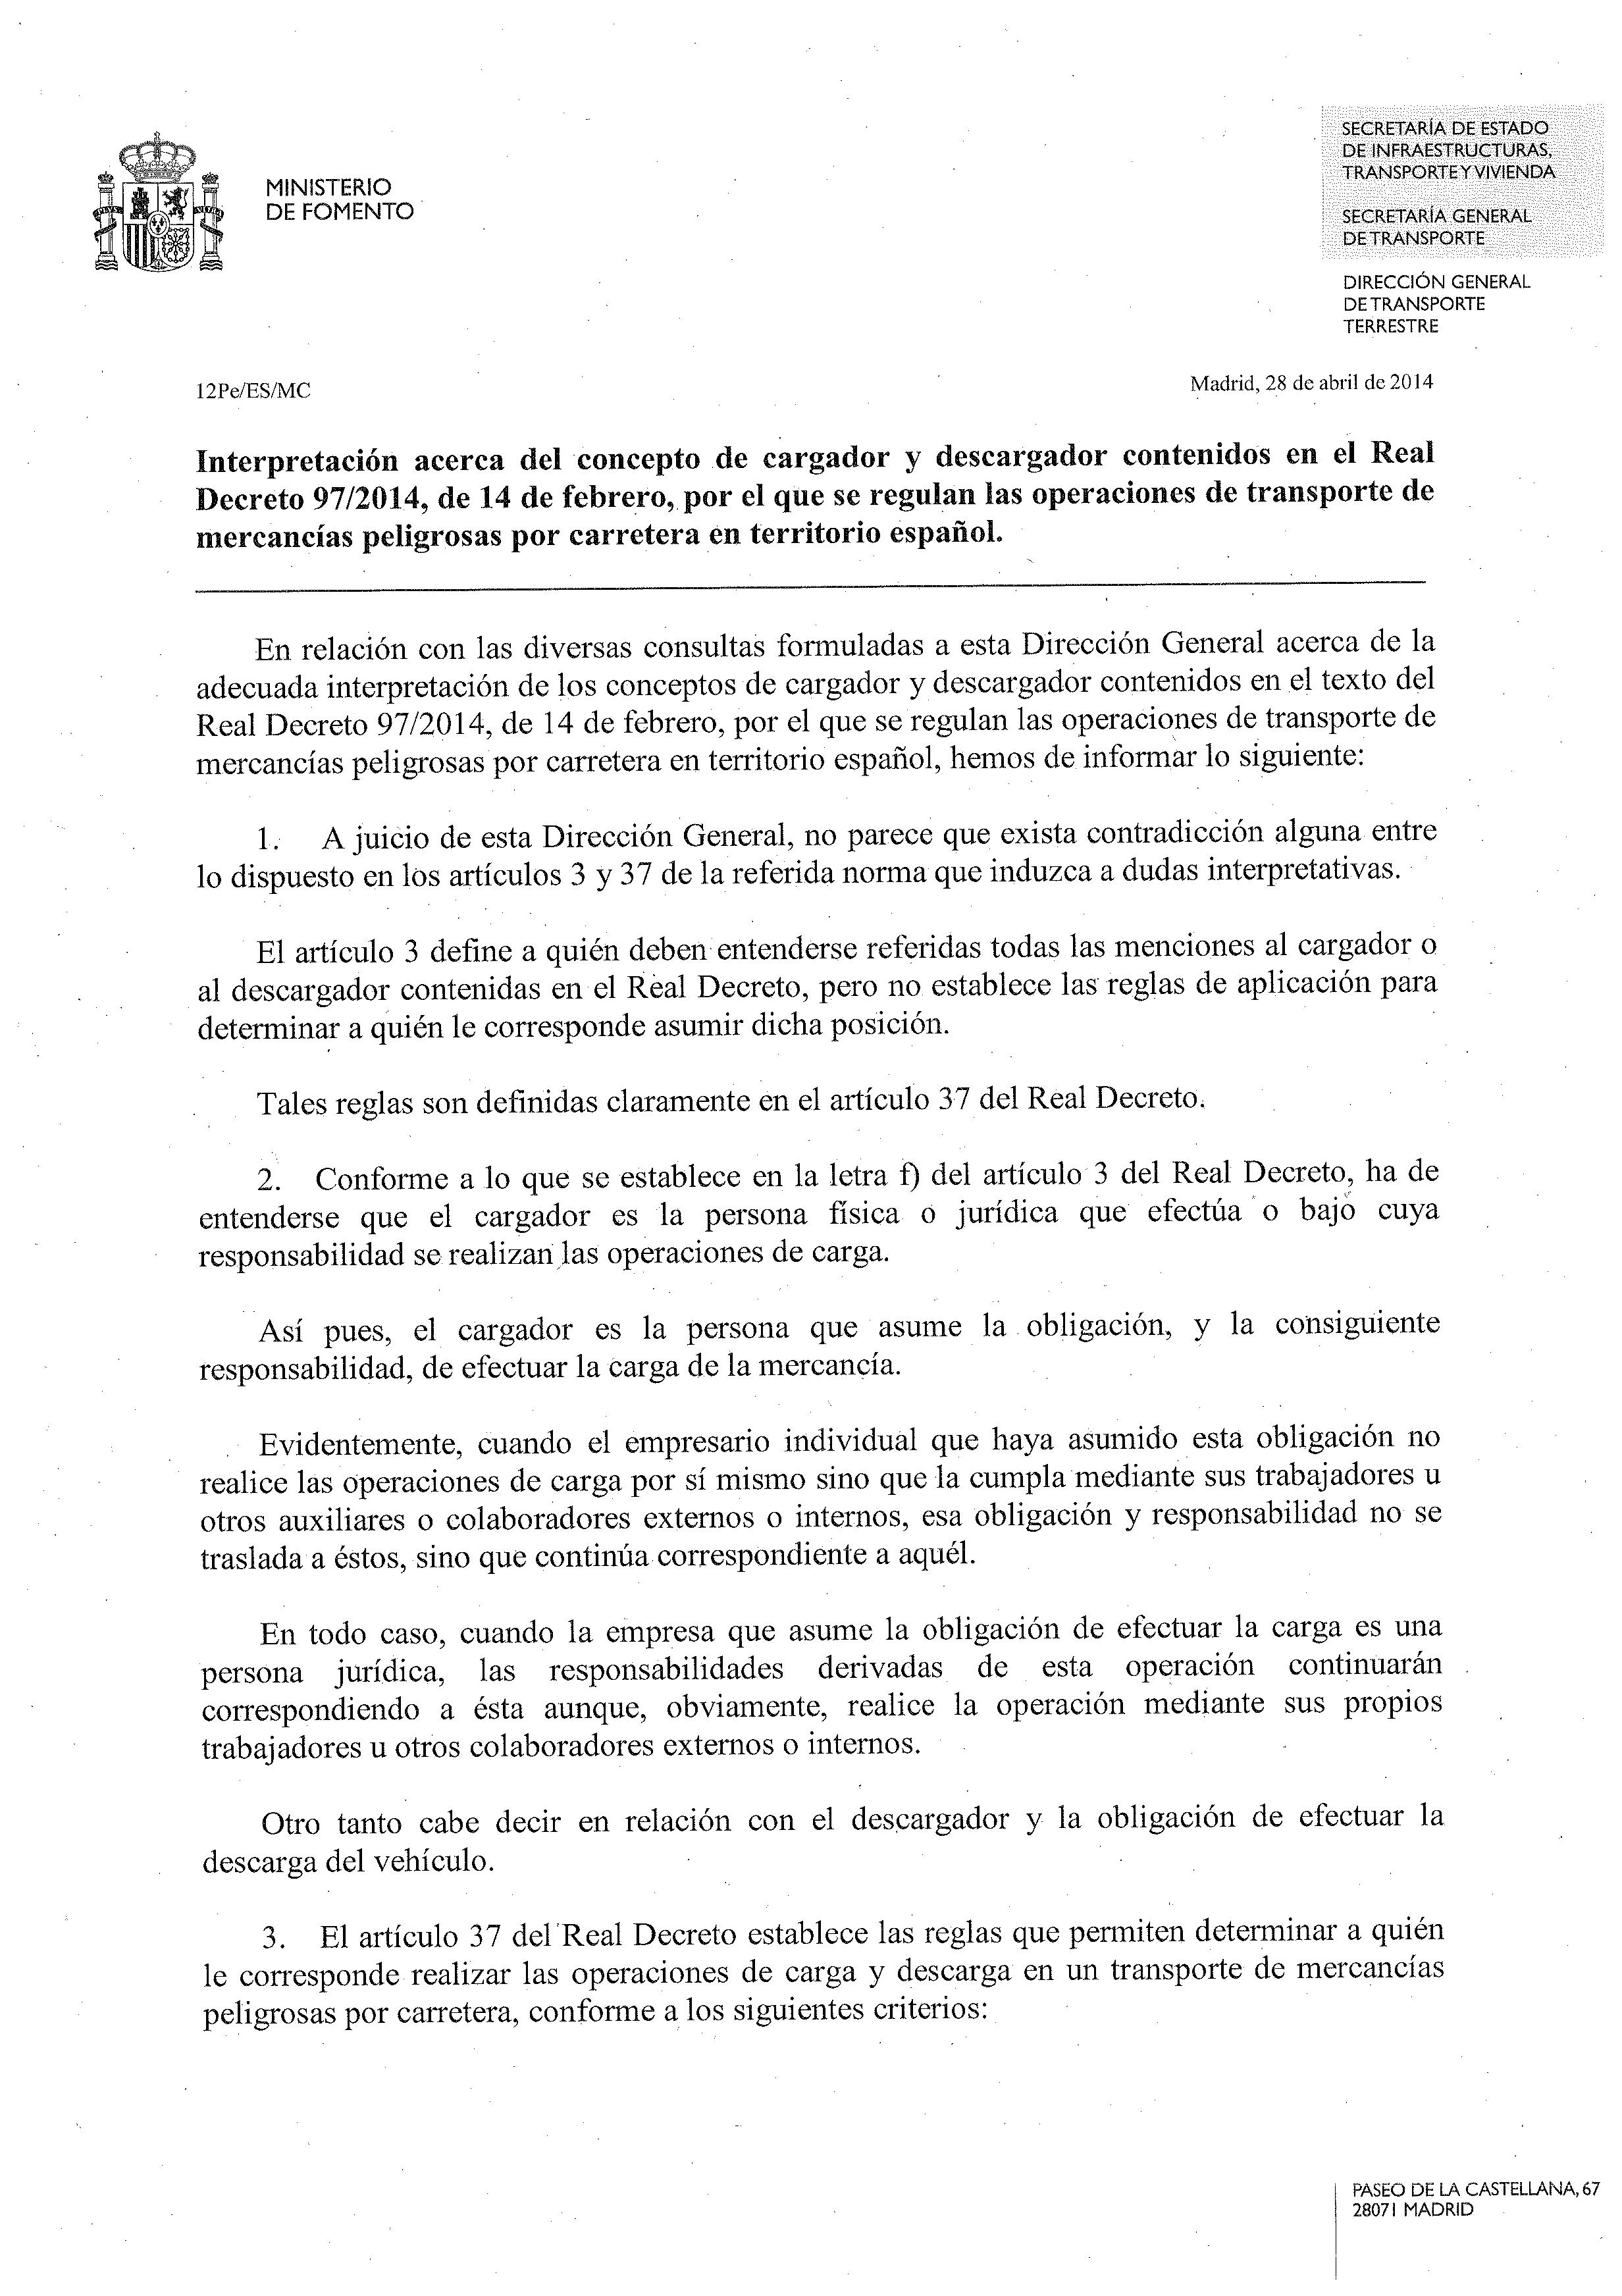 interpretacion-ministerio-fomento-definicion-cargador-descargador-rd97-pagina-1